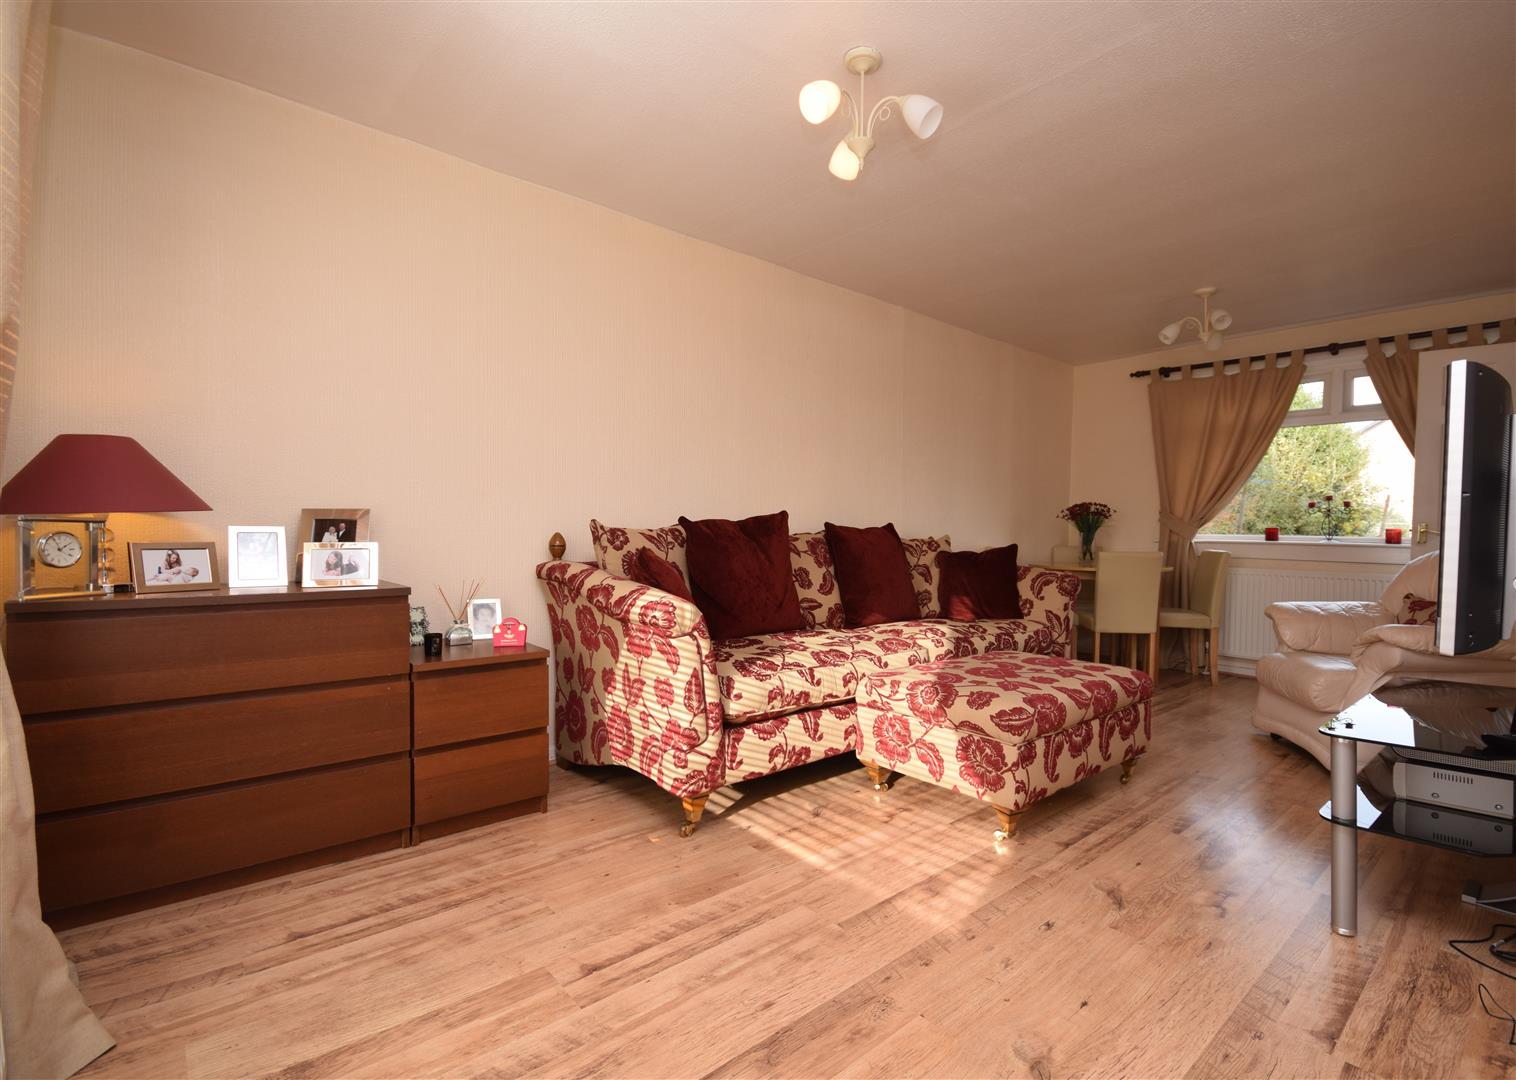 63, Rossie Place, Auchterarder, Perthshire, PH3 1AR, UK